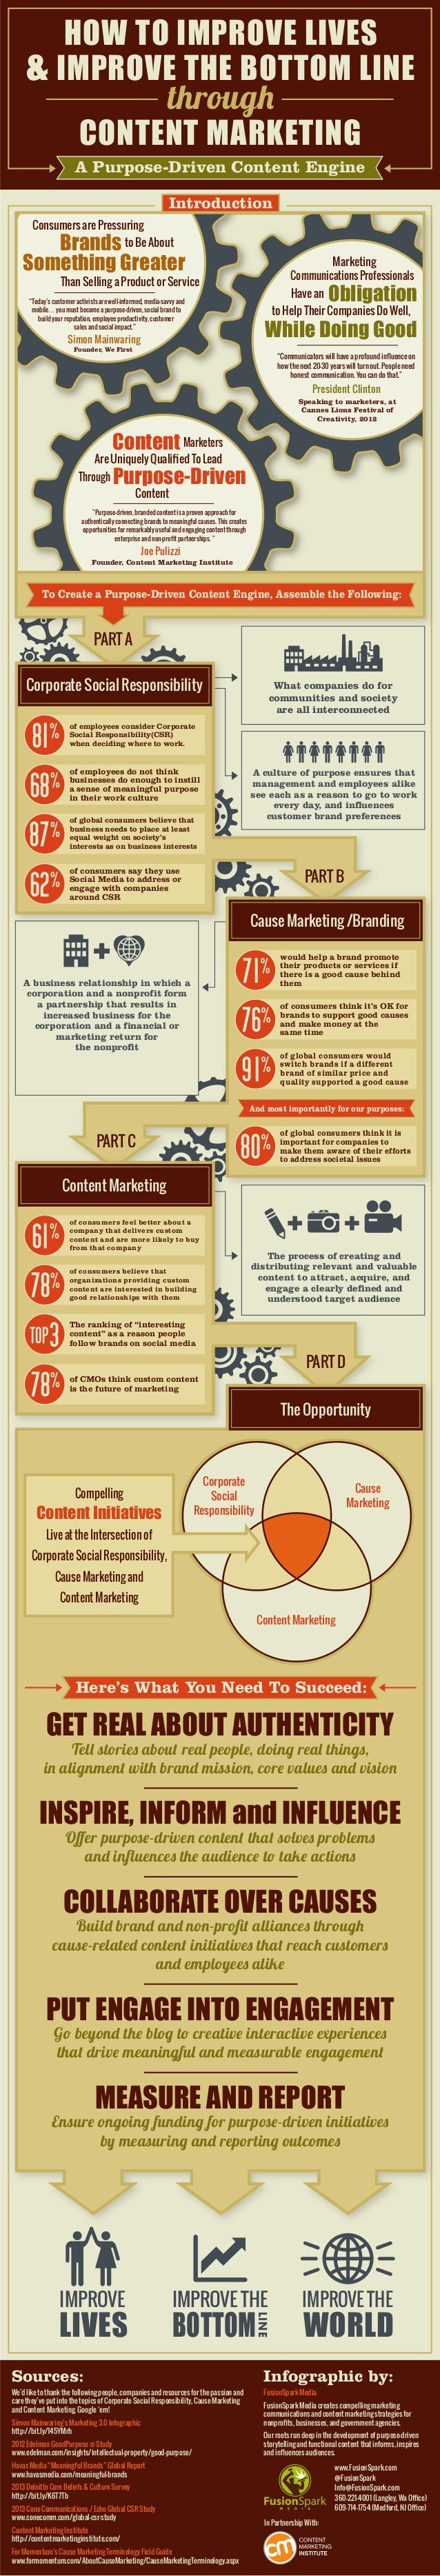 INFOGRAPHIC: Purpose Driven Content Marketing